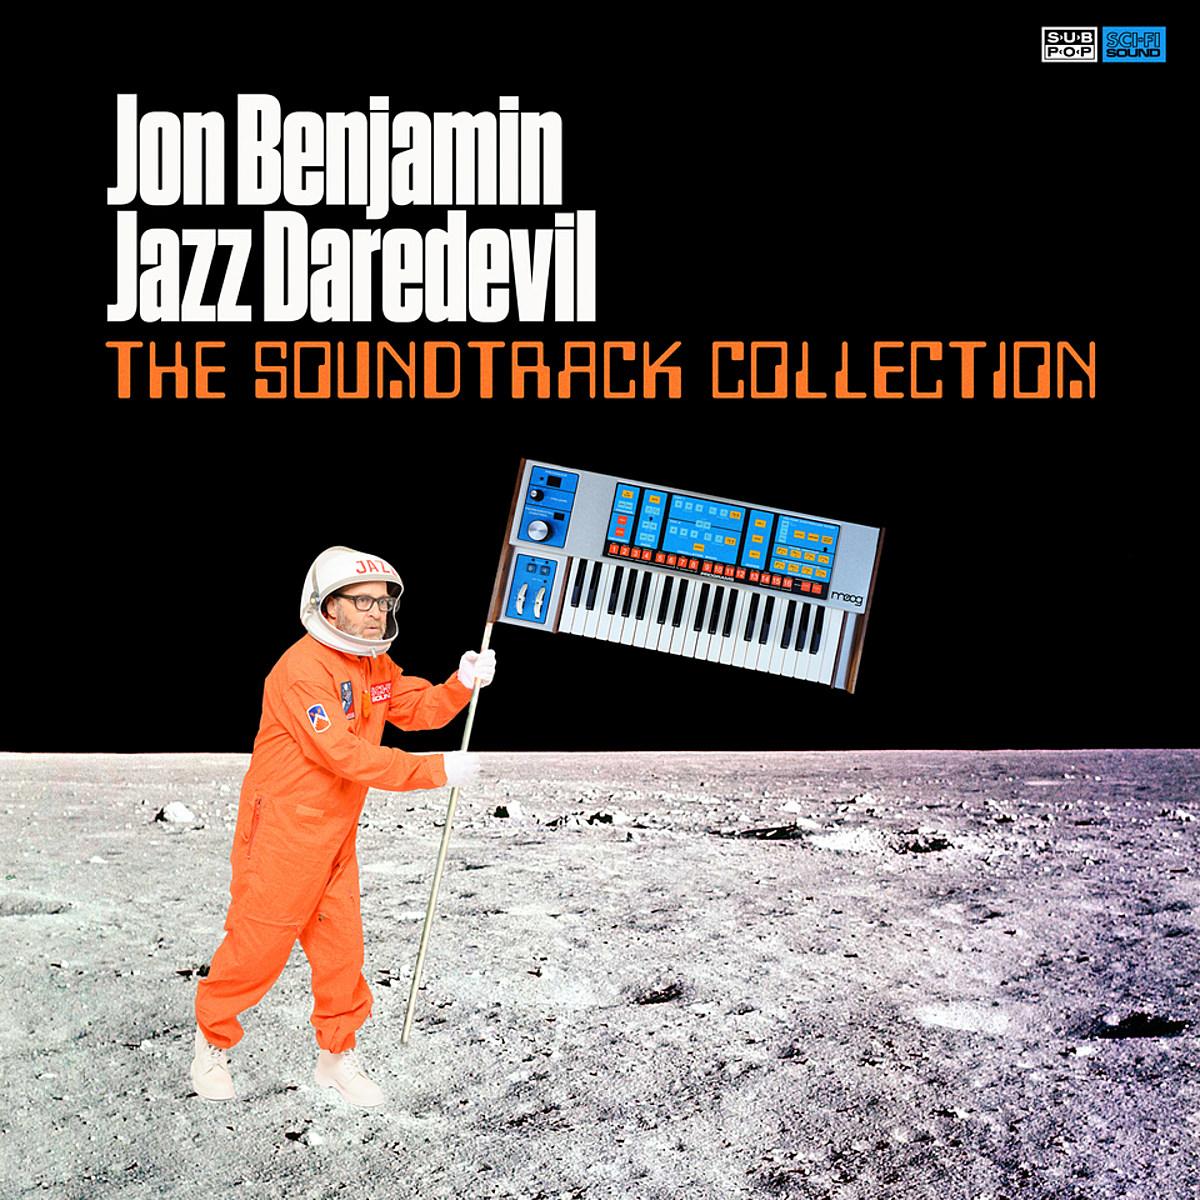 comedian Jon Benjamin covers songs from Top Gun, Beverly Hills Cop & more on new LP